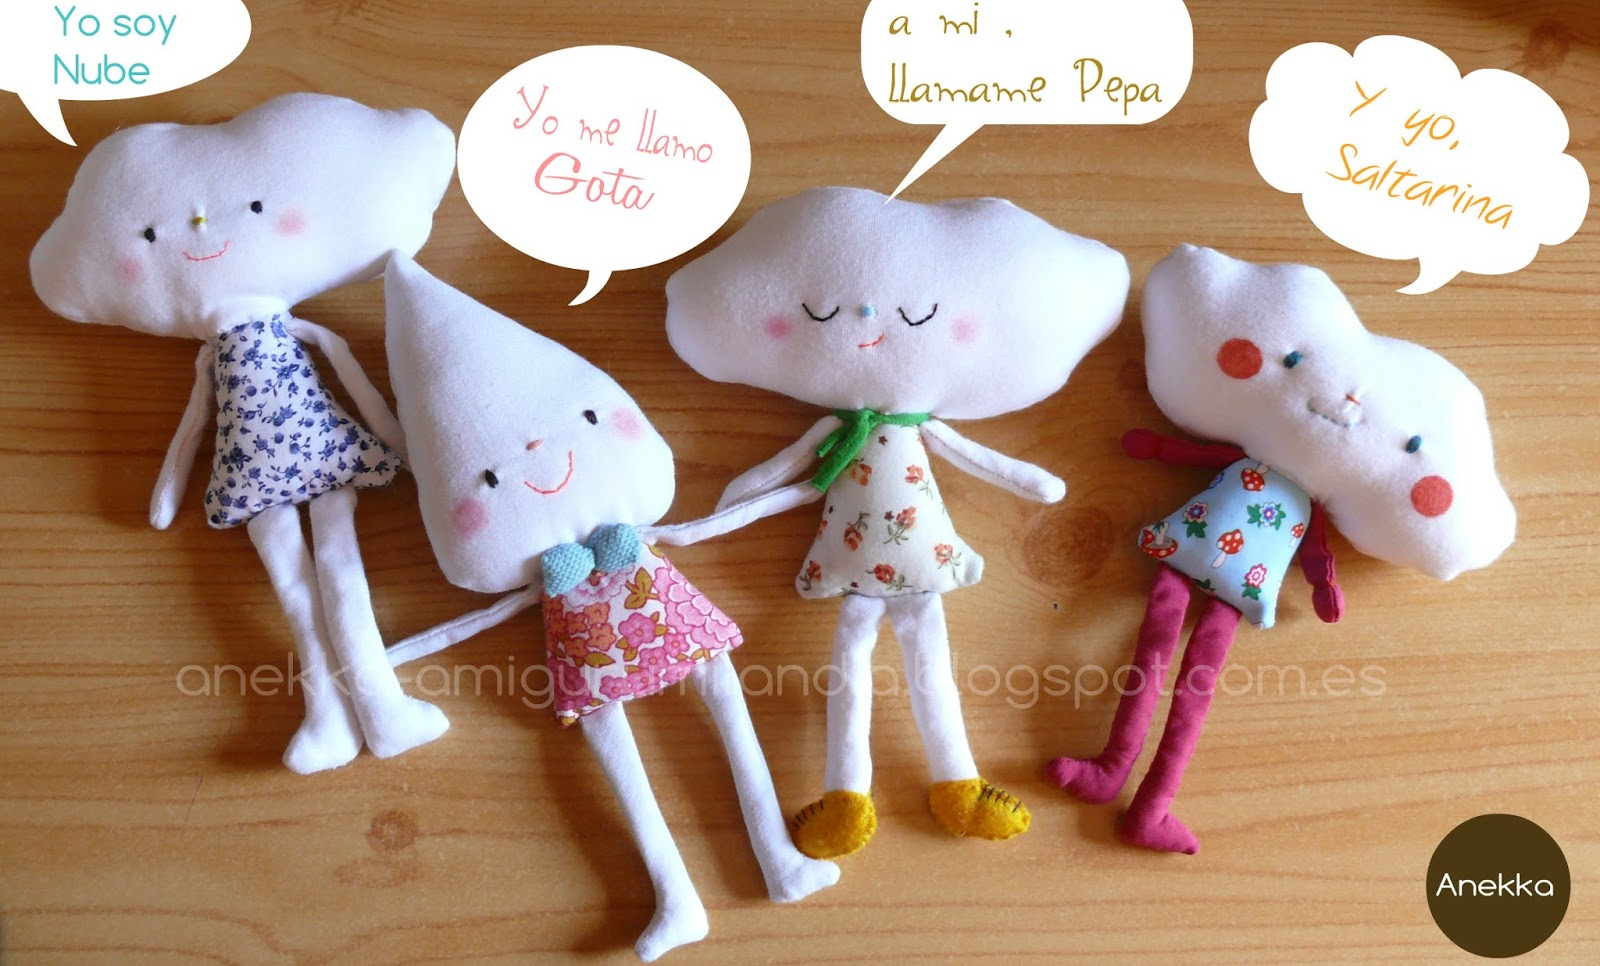 toy doll anekka handmade